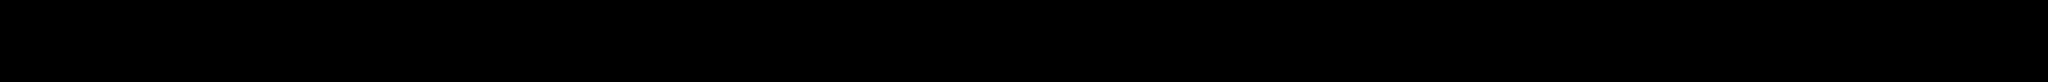 ATE 14020.22038.02/16, 250083, 34 11 1 103 723, 34 11 1 119 175, 34 11 1 158 692 Σετ στεγανοπ., δαγκάνα φρένων